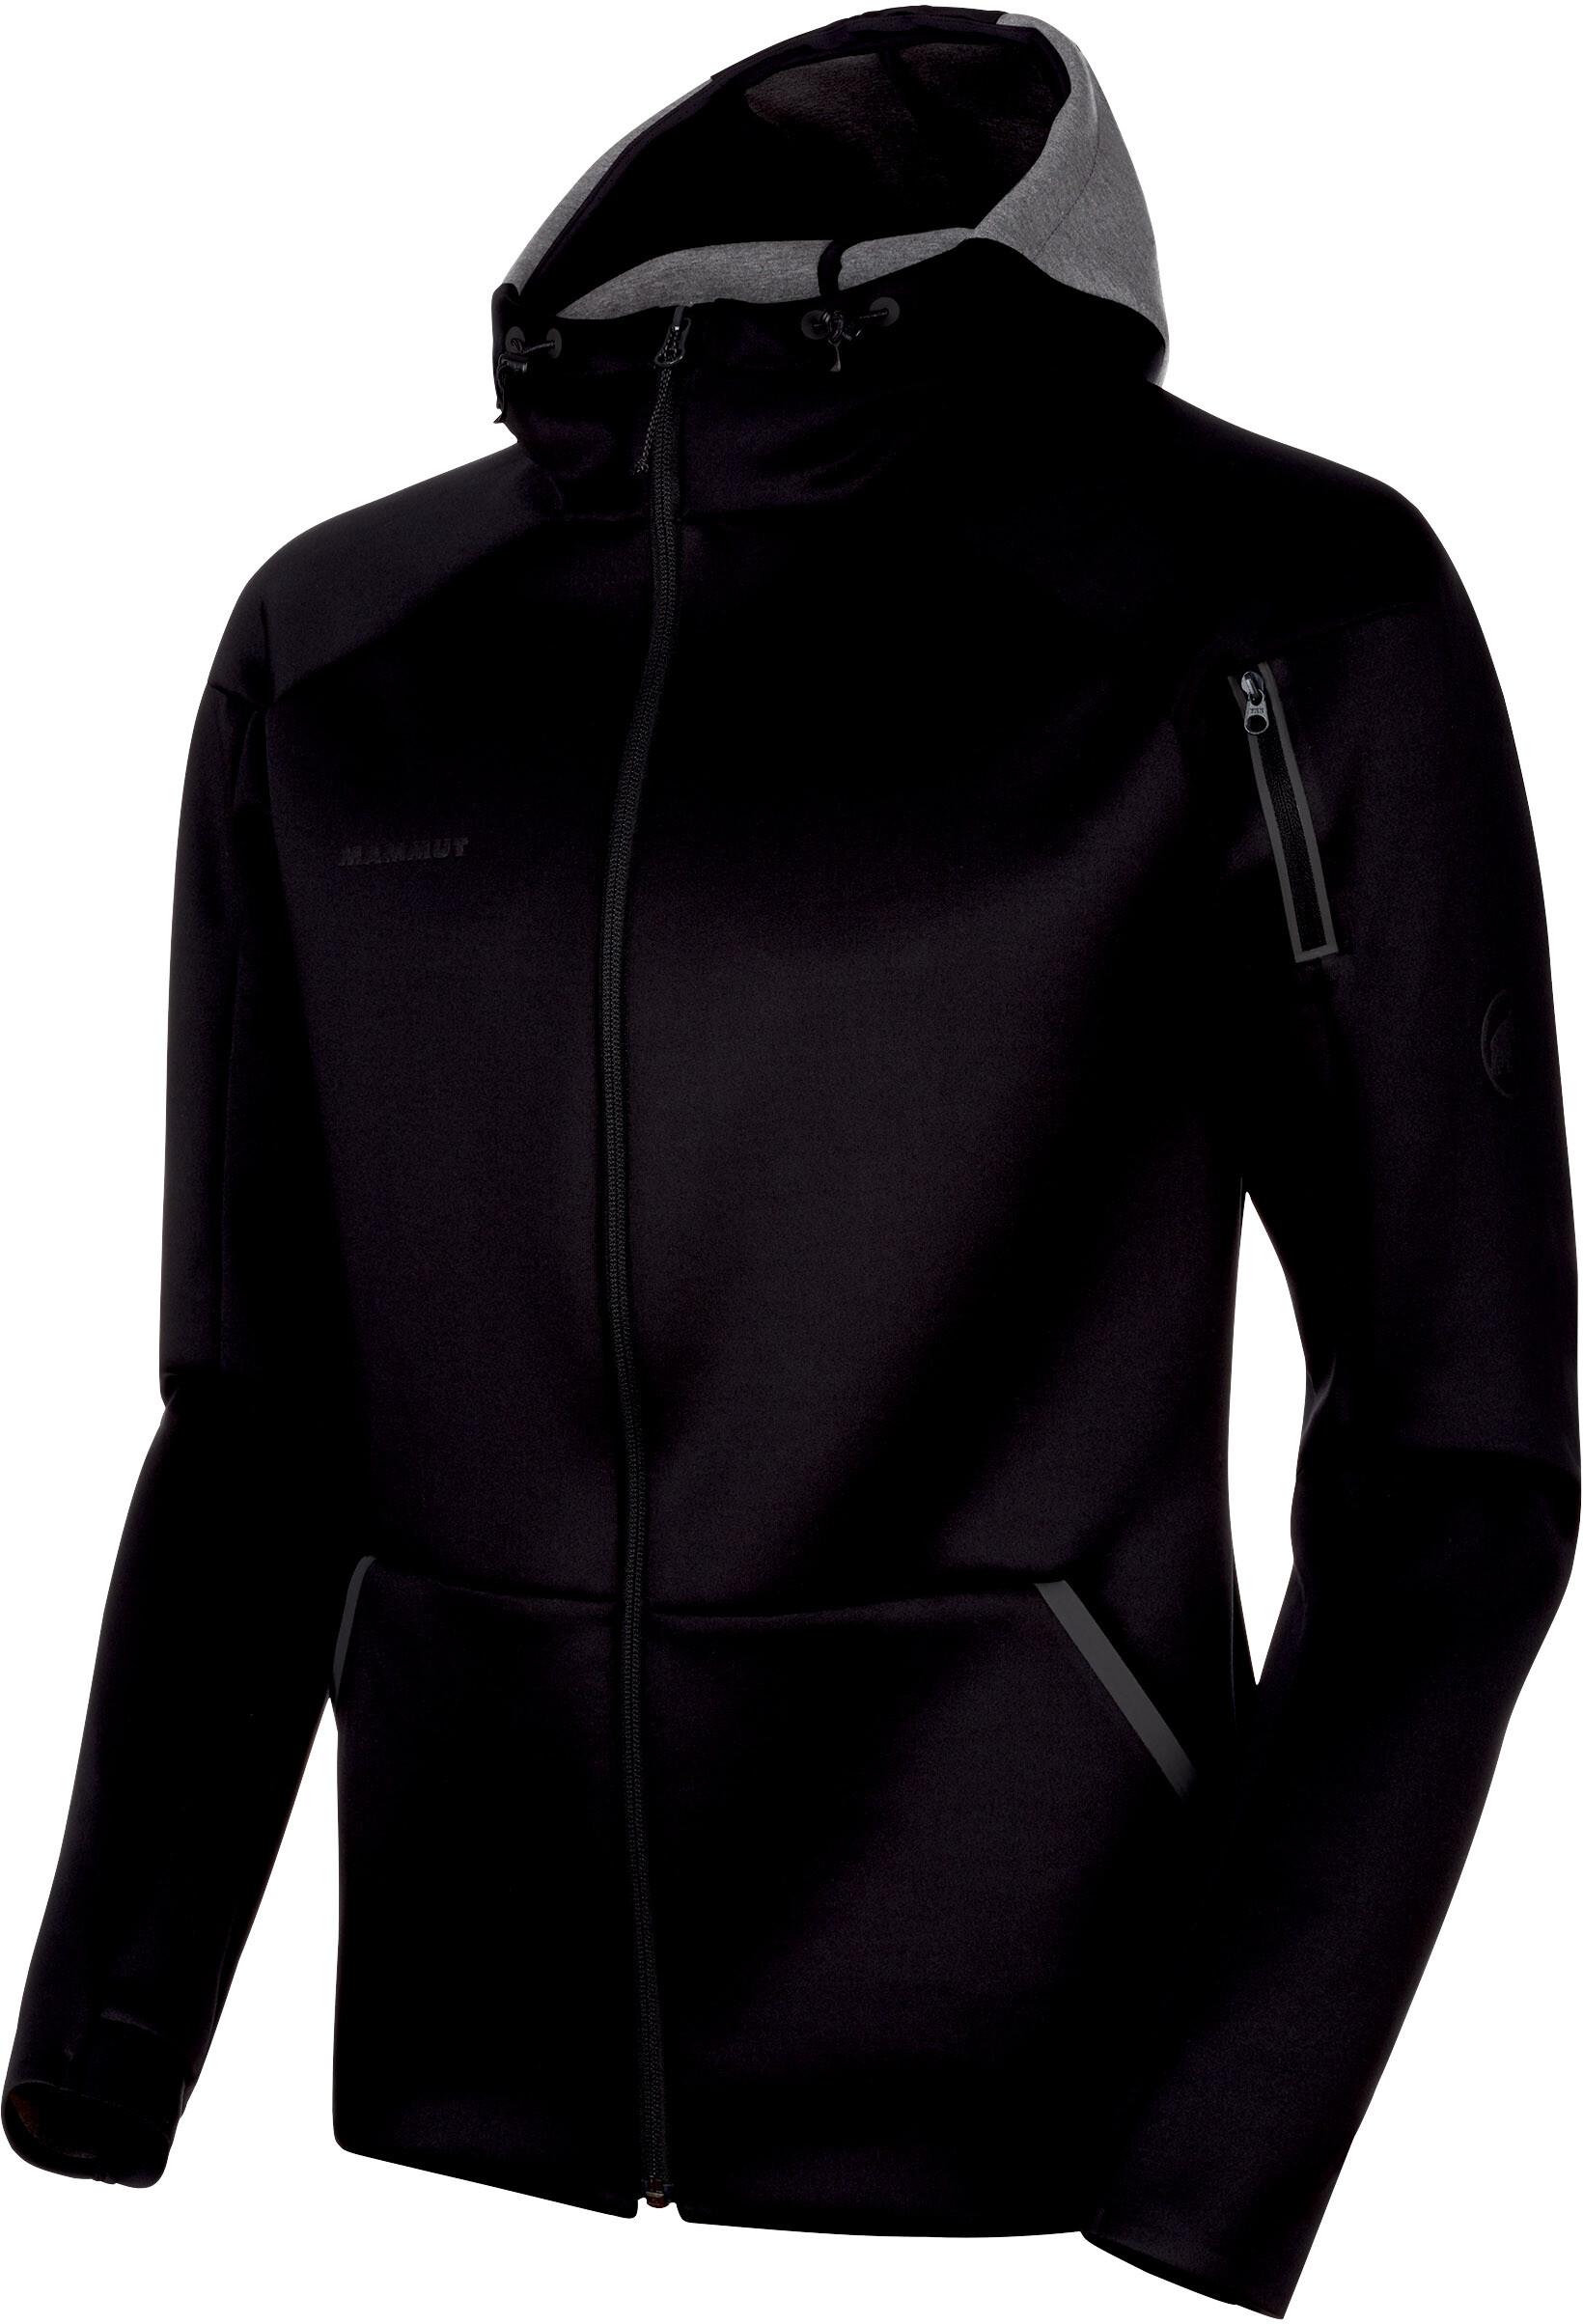 b1a87723 Mammut Logo Jakke Herrer, black melange | Find outdoortøj, sko ...